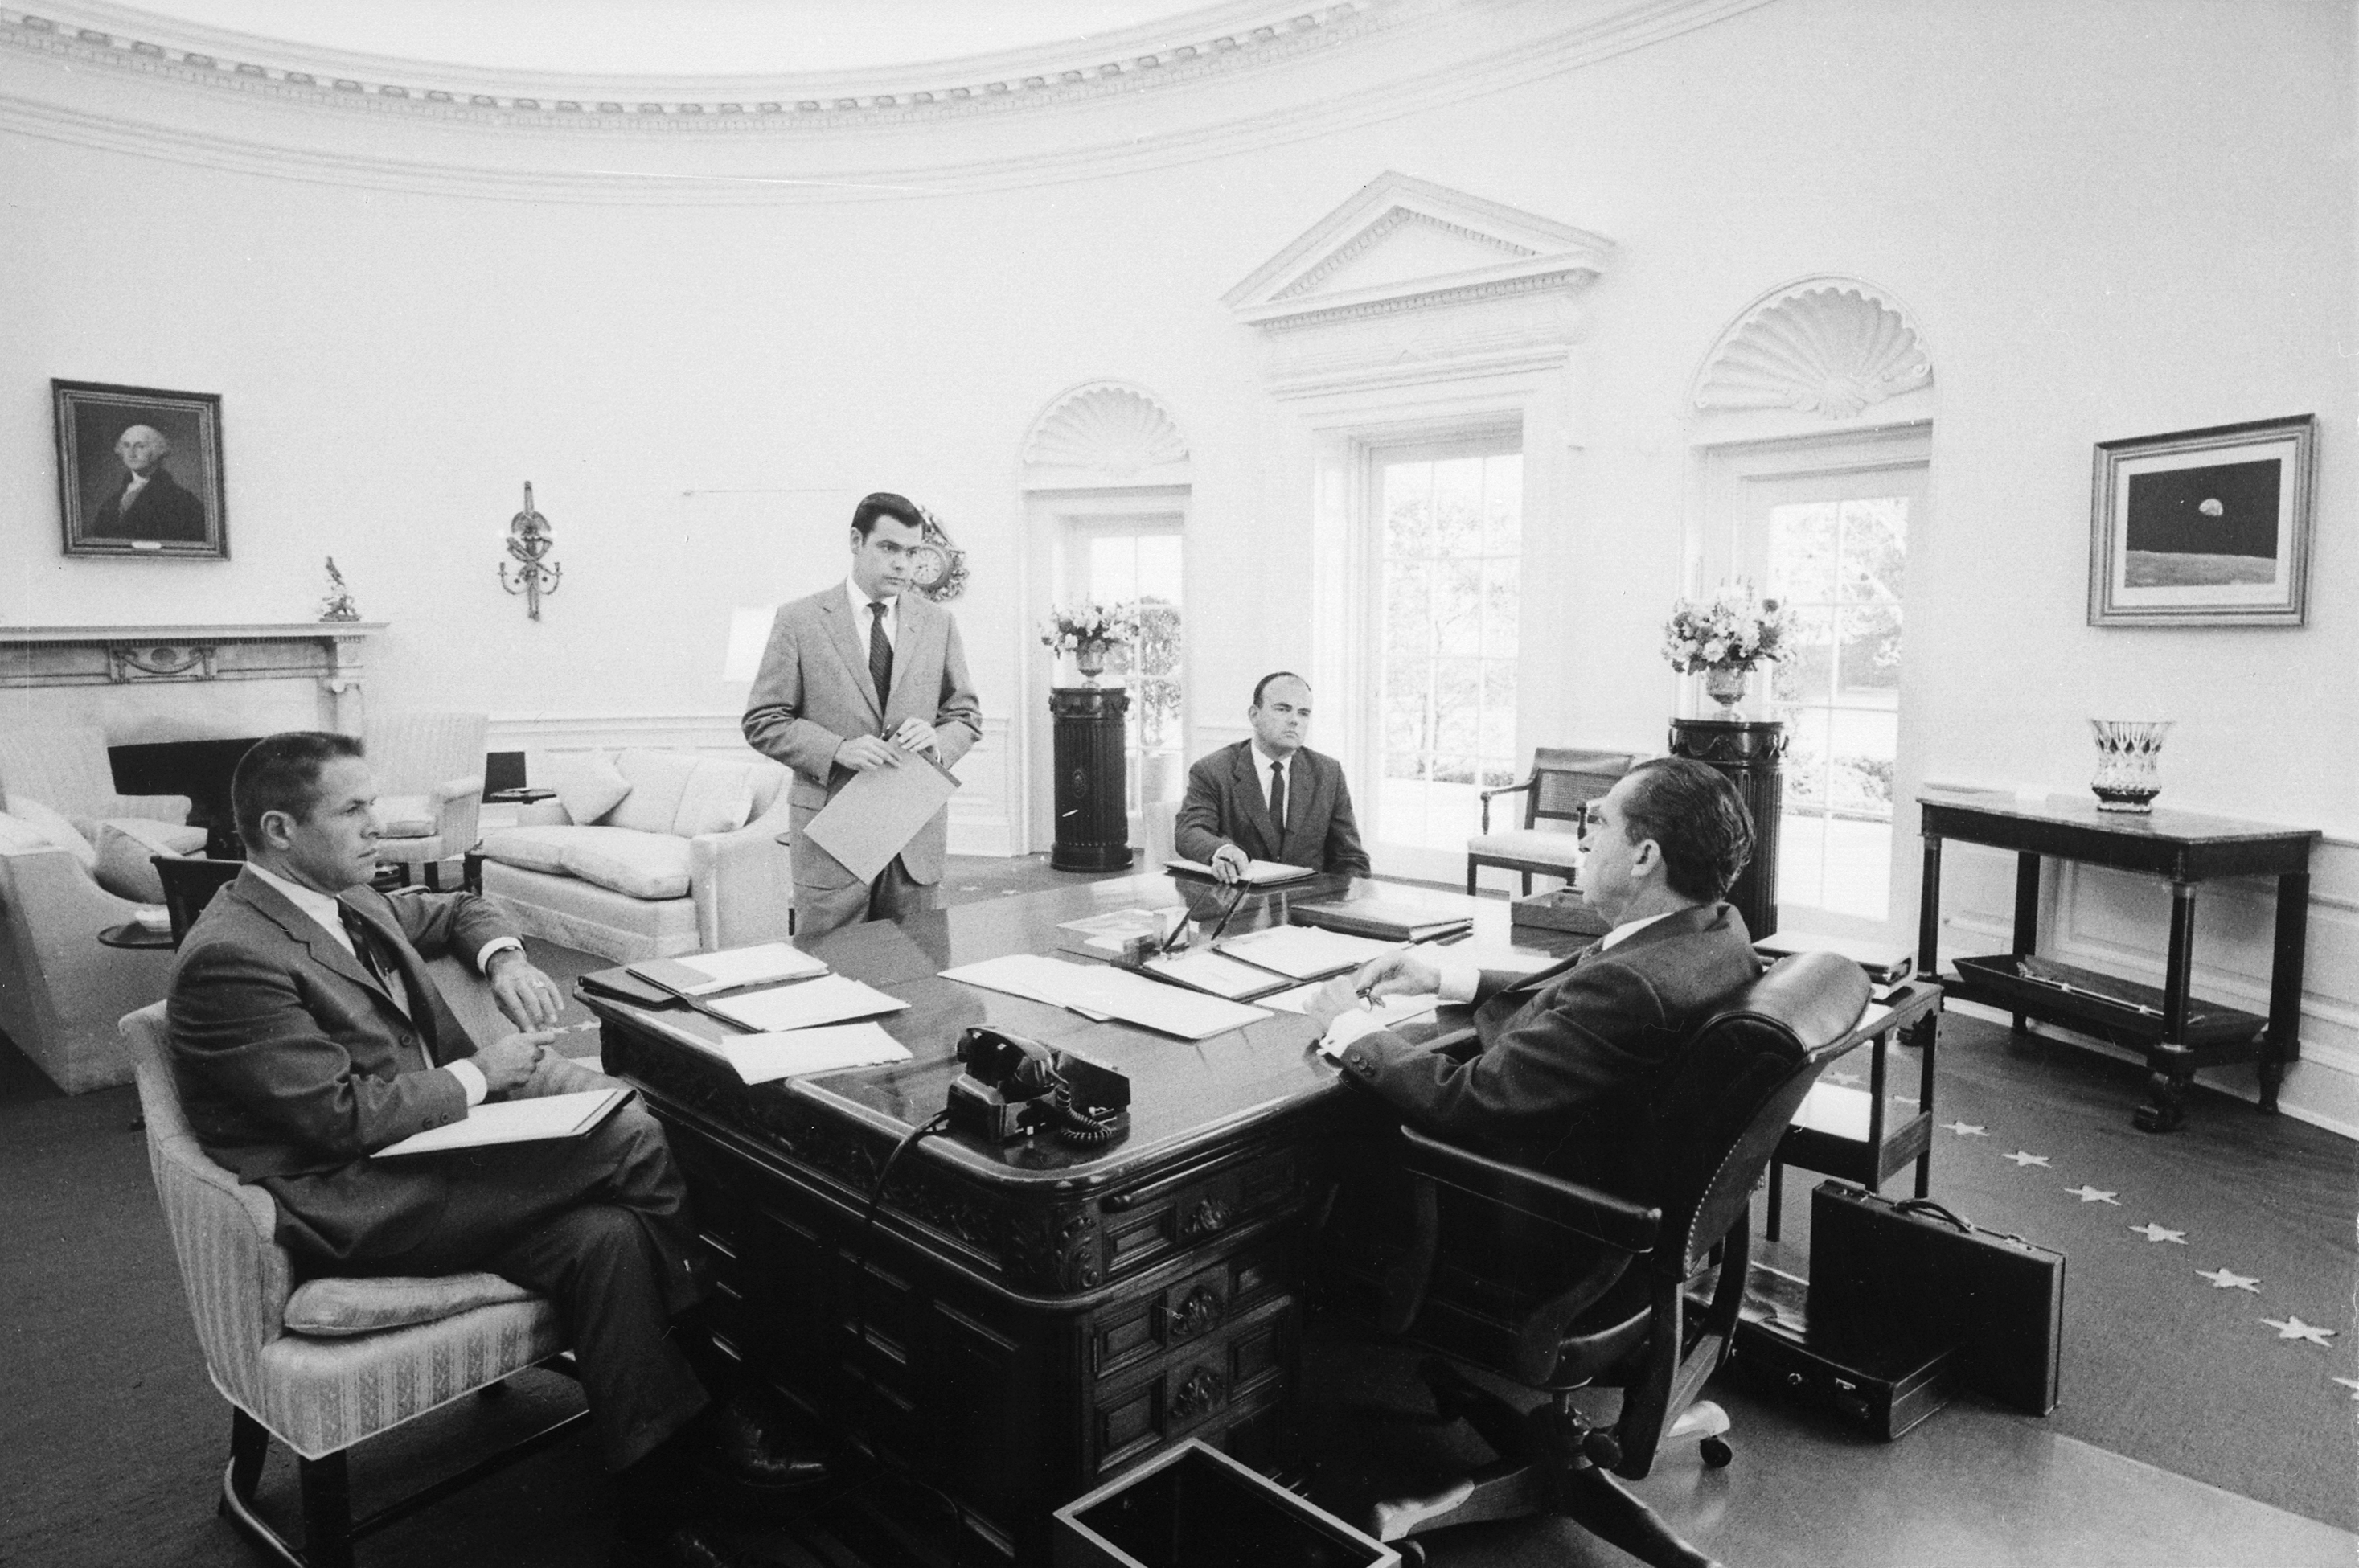 H.R. Haldeman, Dwight Chapin, John D. Ehrlichman, President Richard Nixon, March 1970